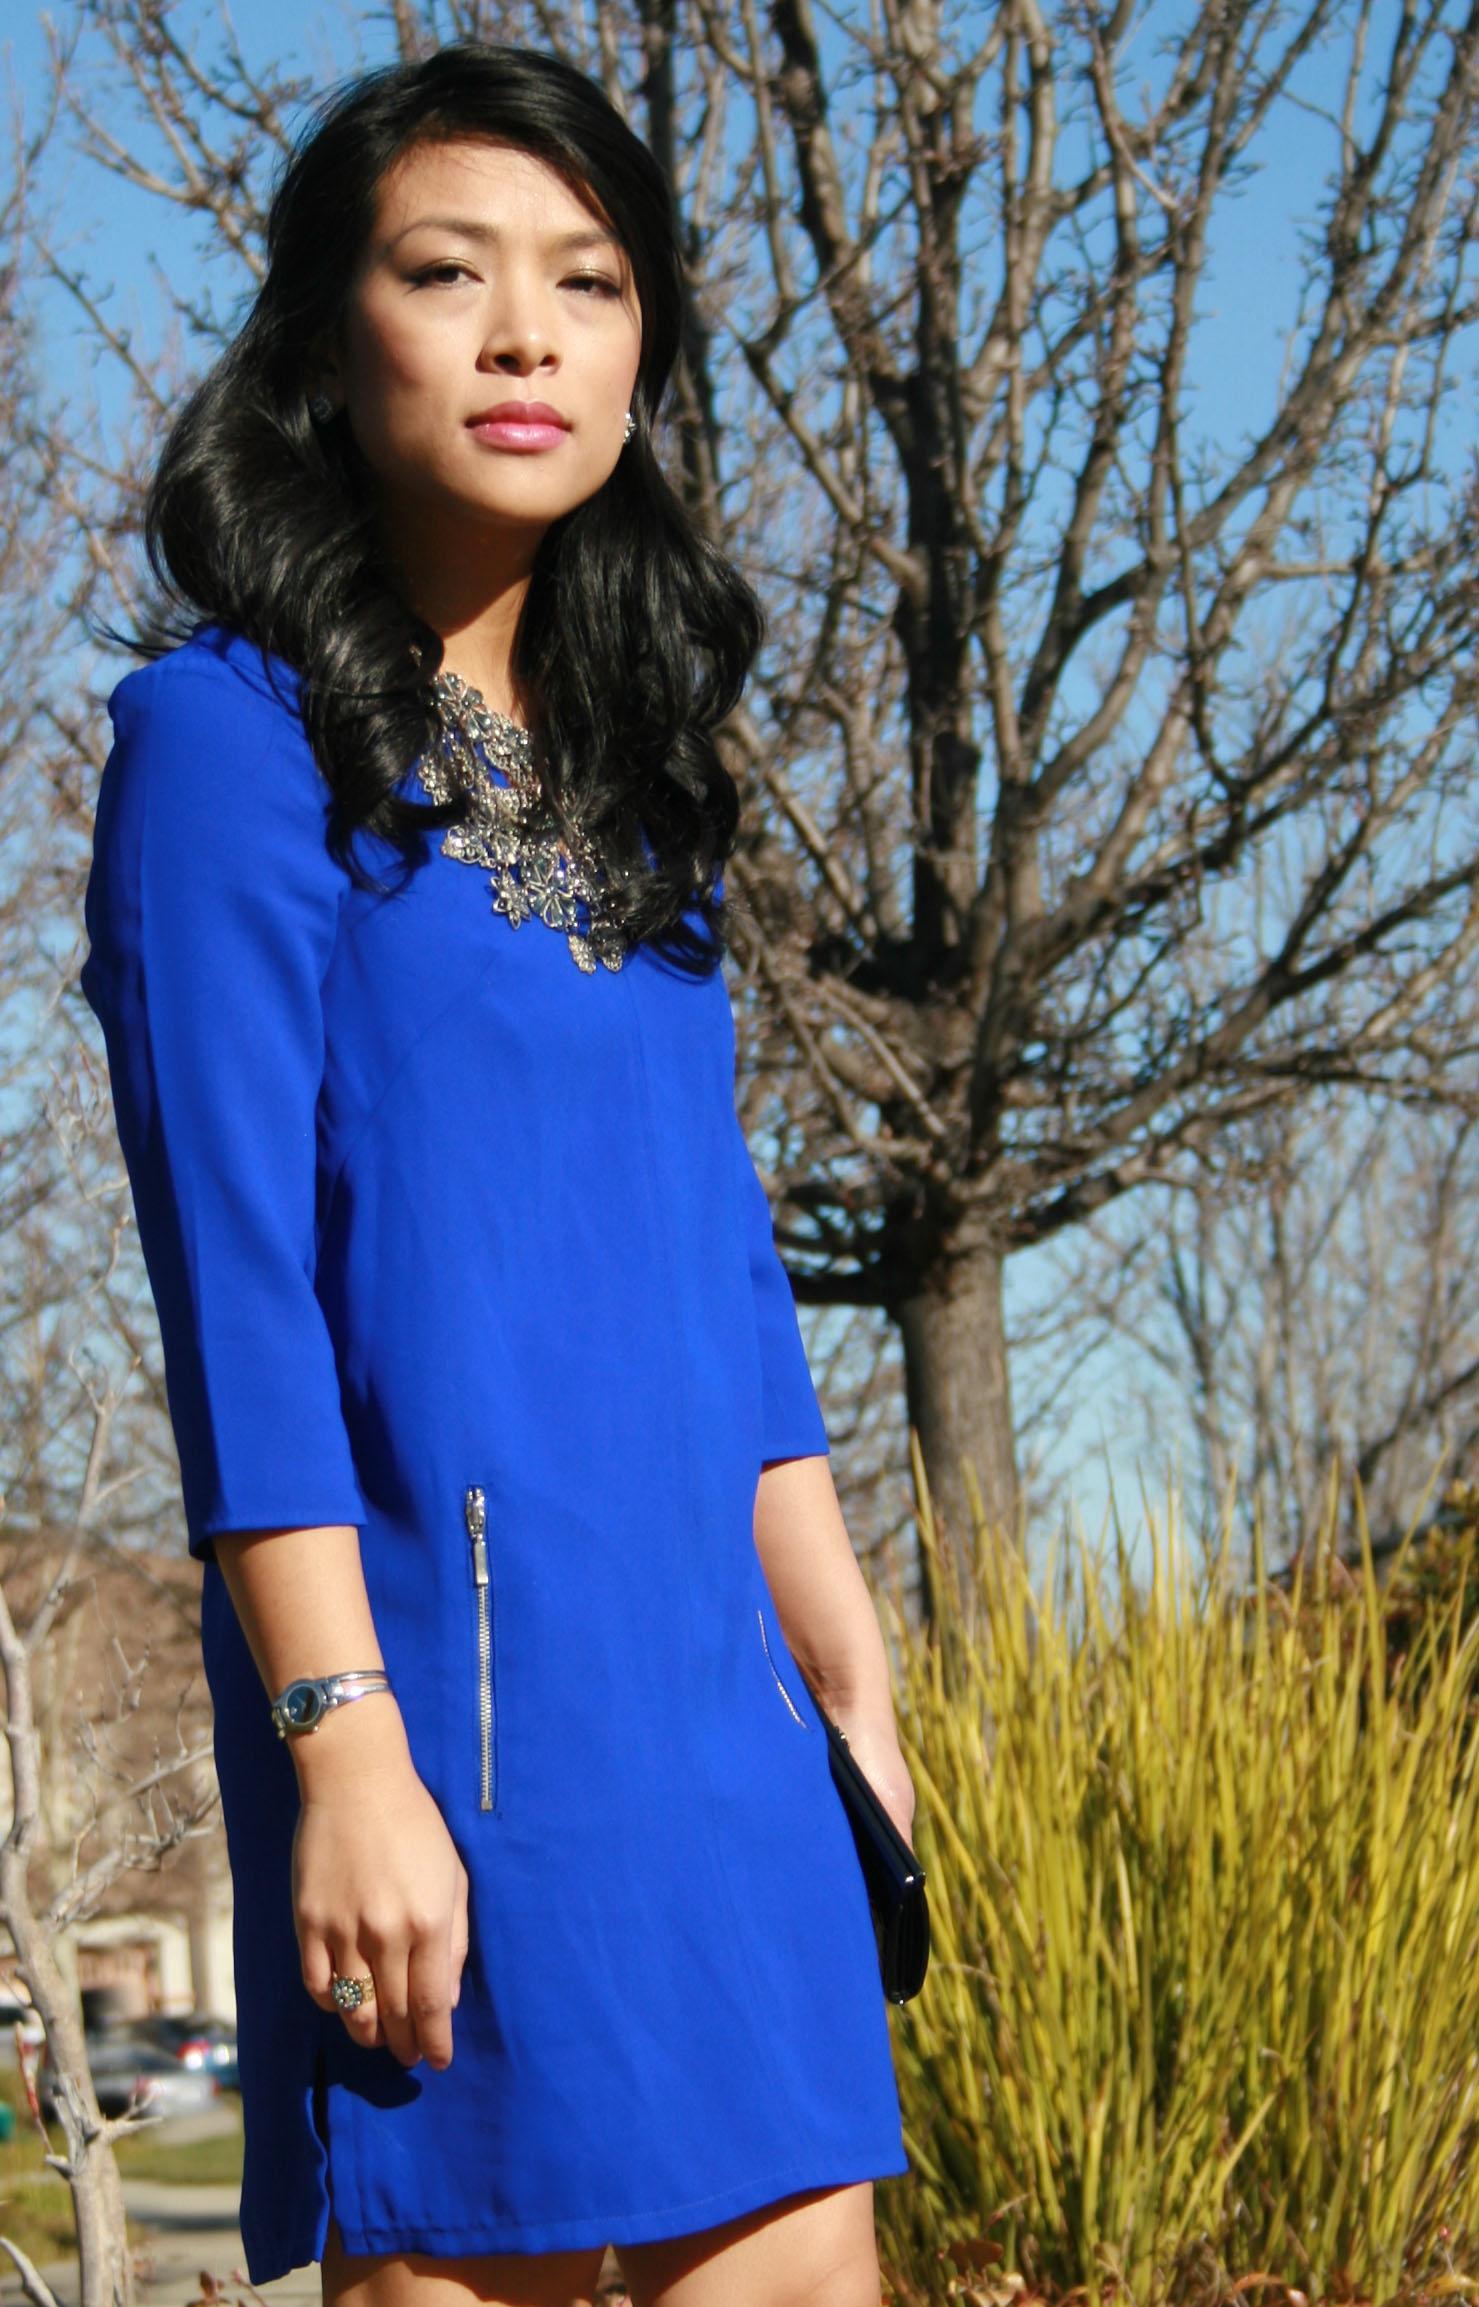 Chic Blue Dress Royal Blue Shift H&m Dress Old